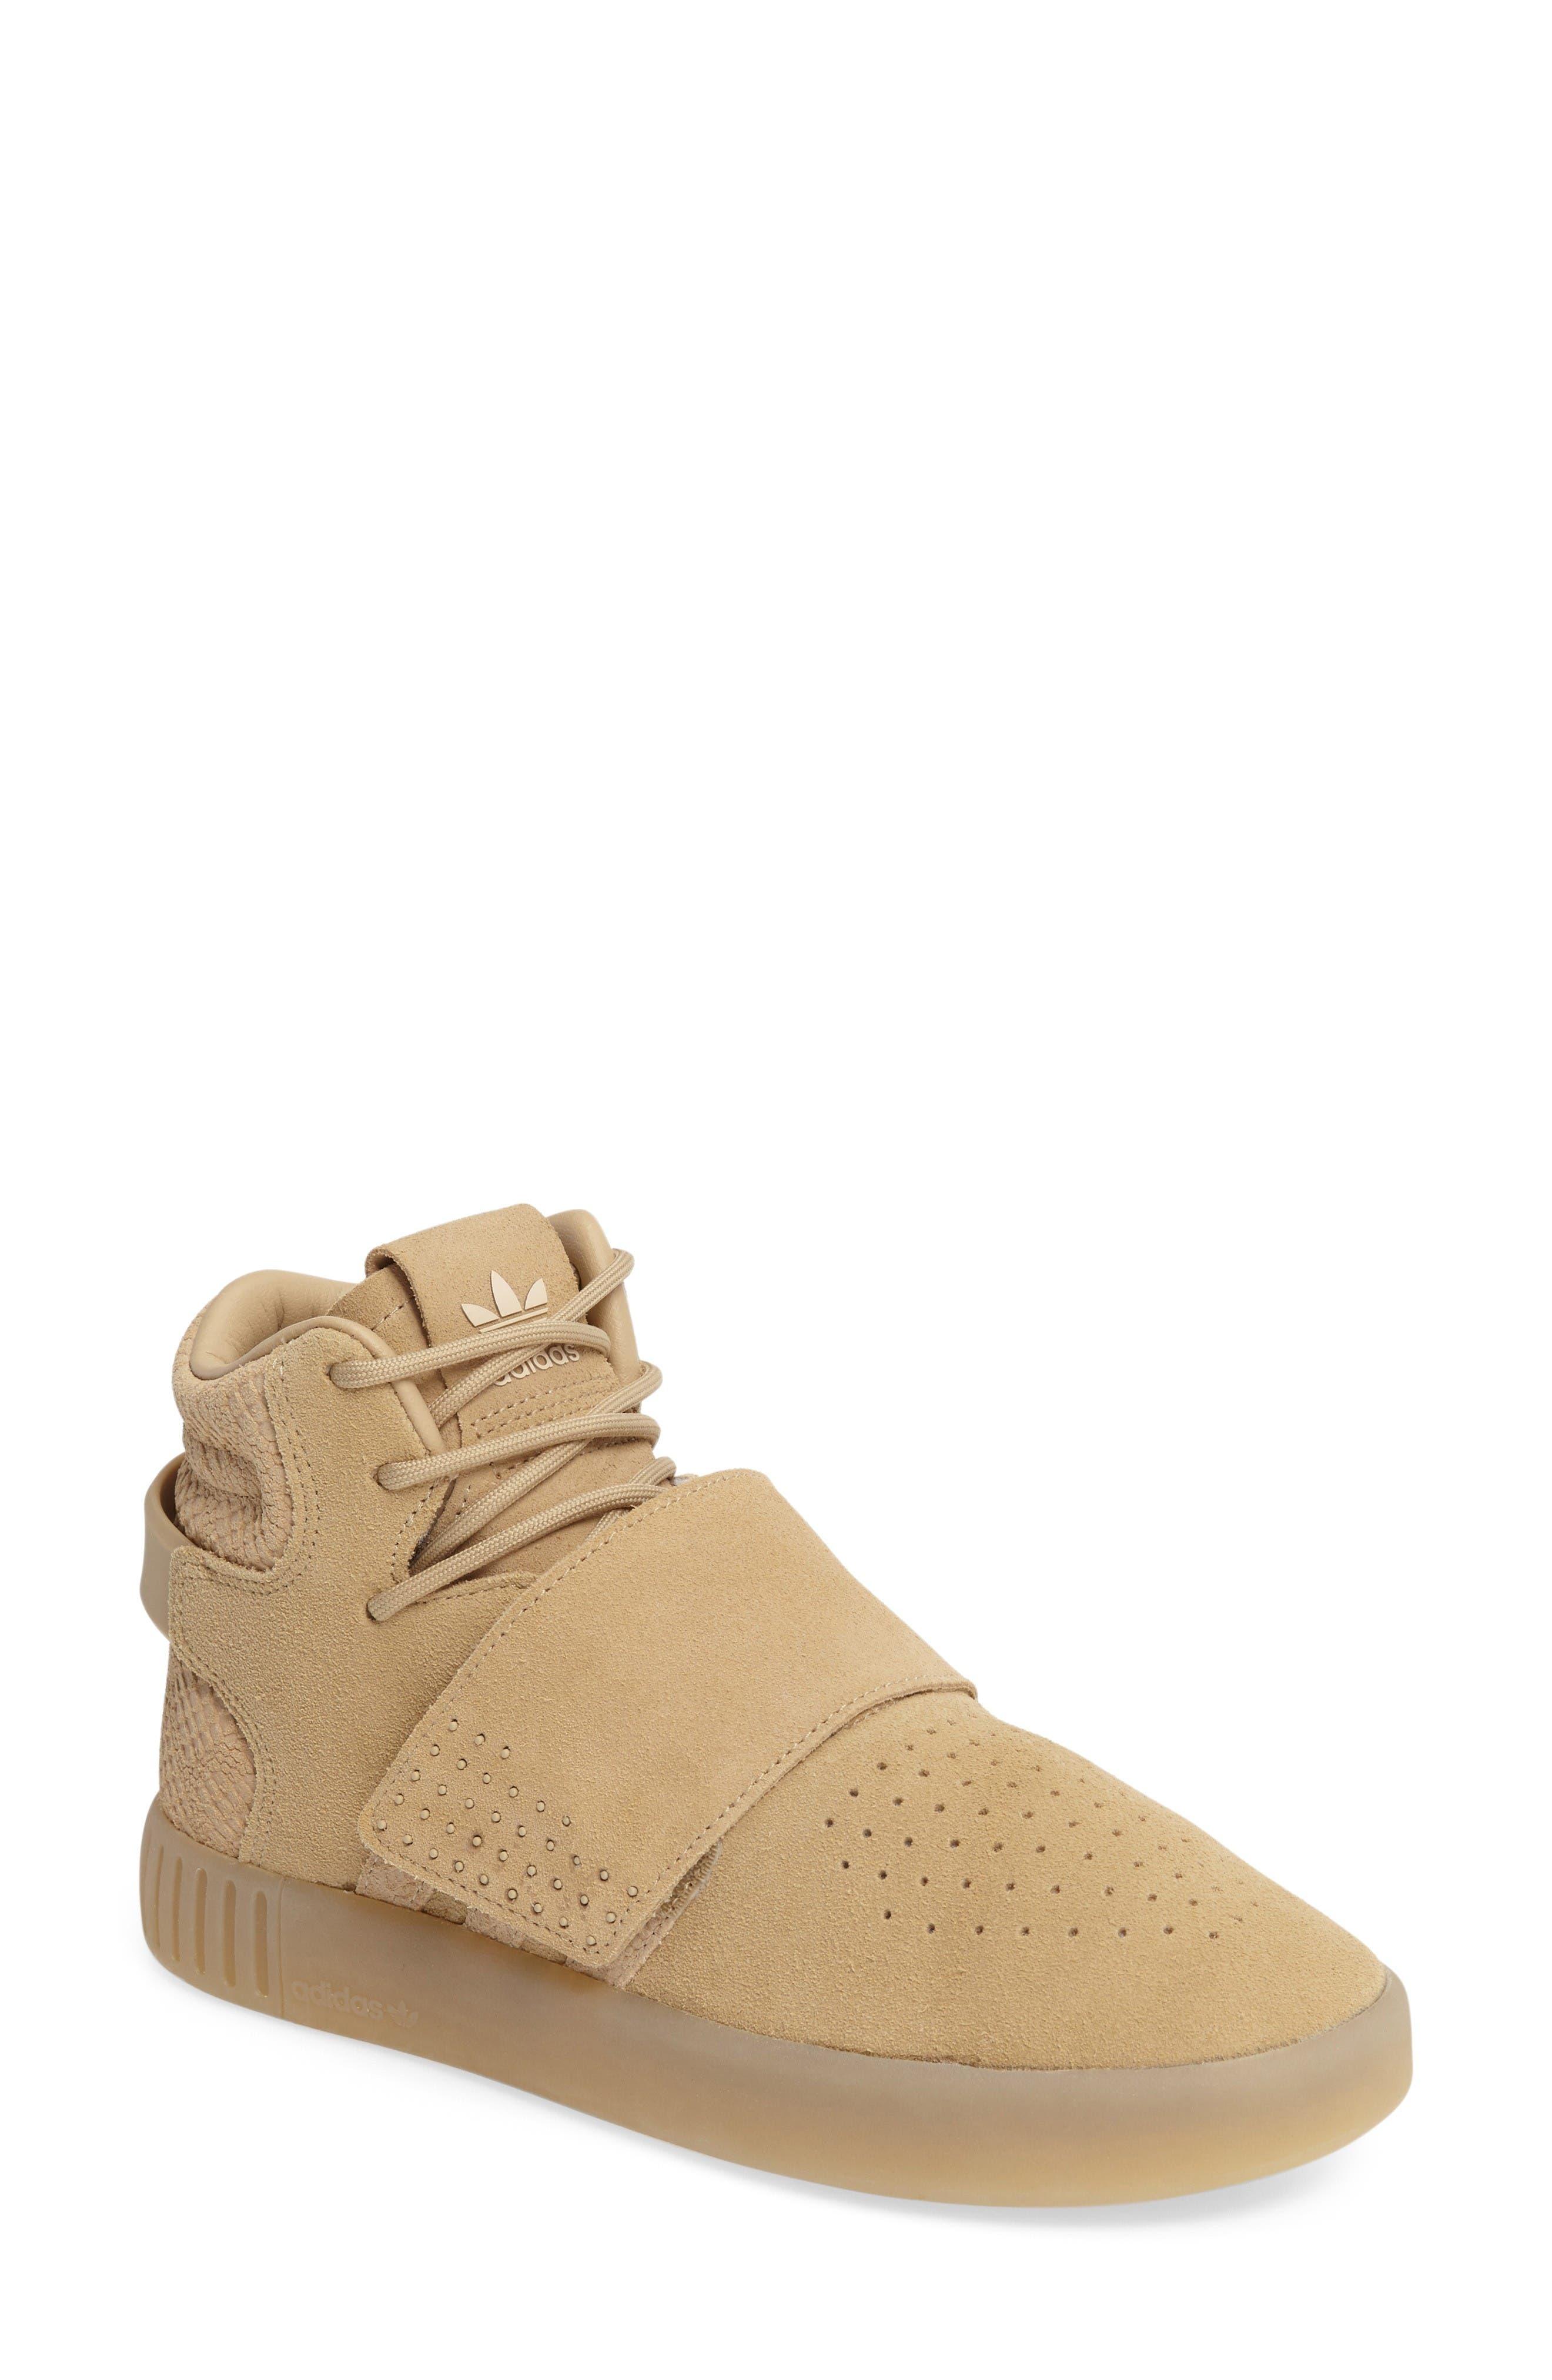 adidas Tubular Sneaker (Women)